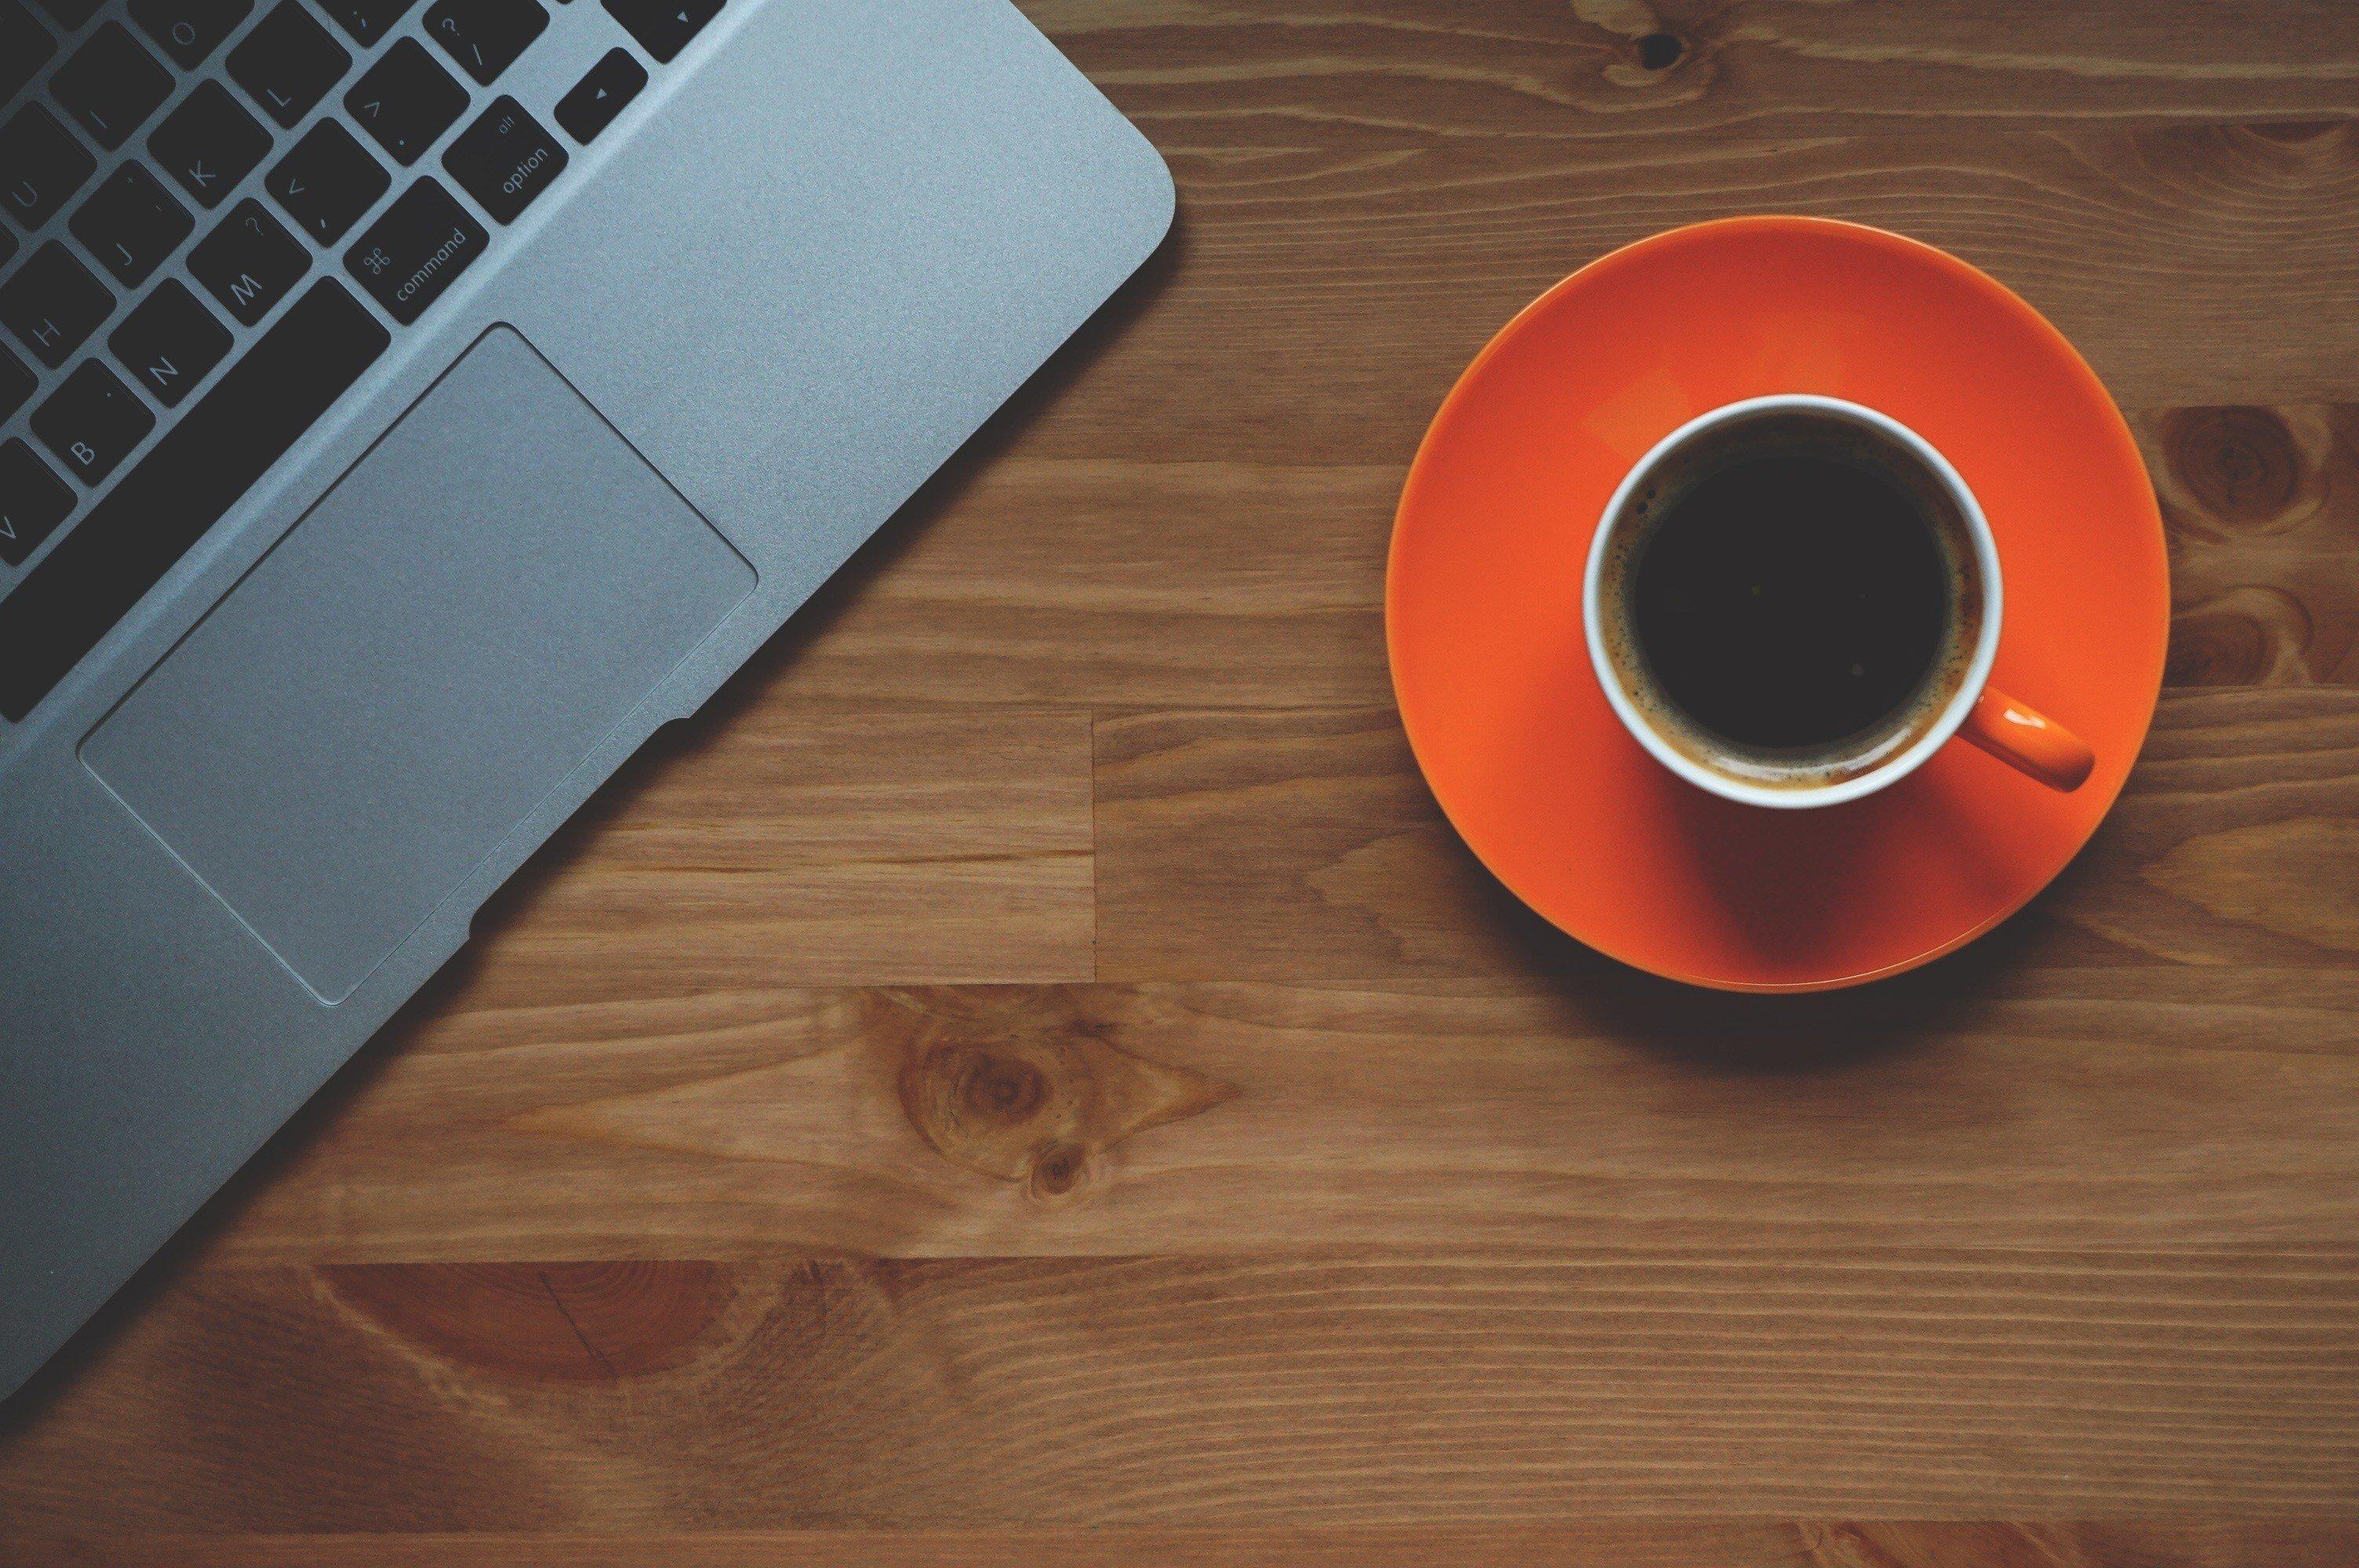 Wallpaper 3008x2000 Px Coffee Cup Freelance Laptop Minimalism